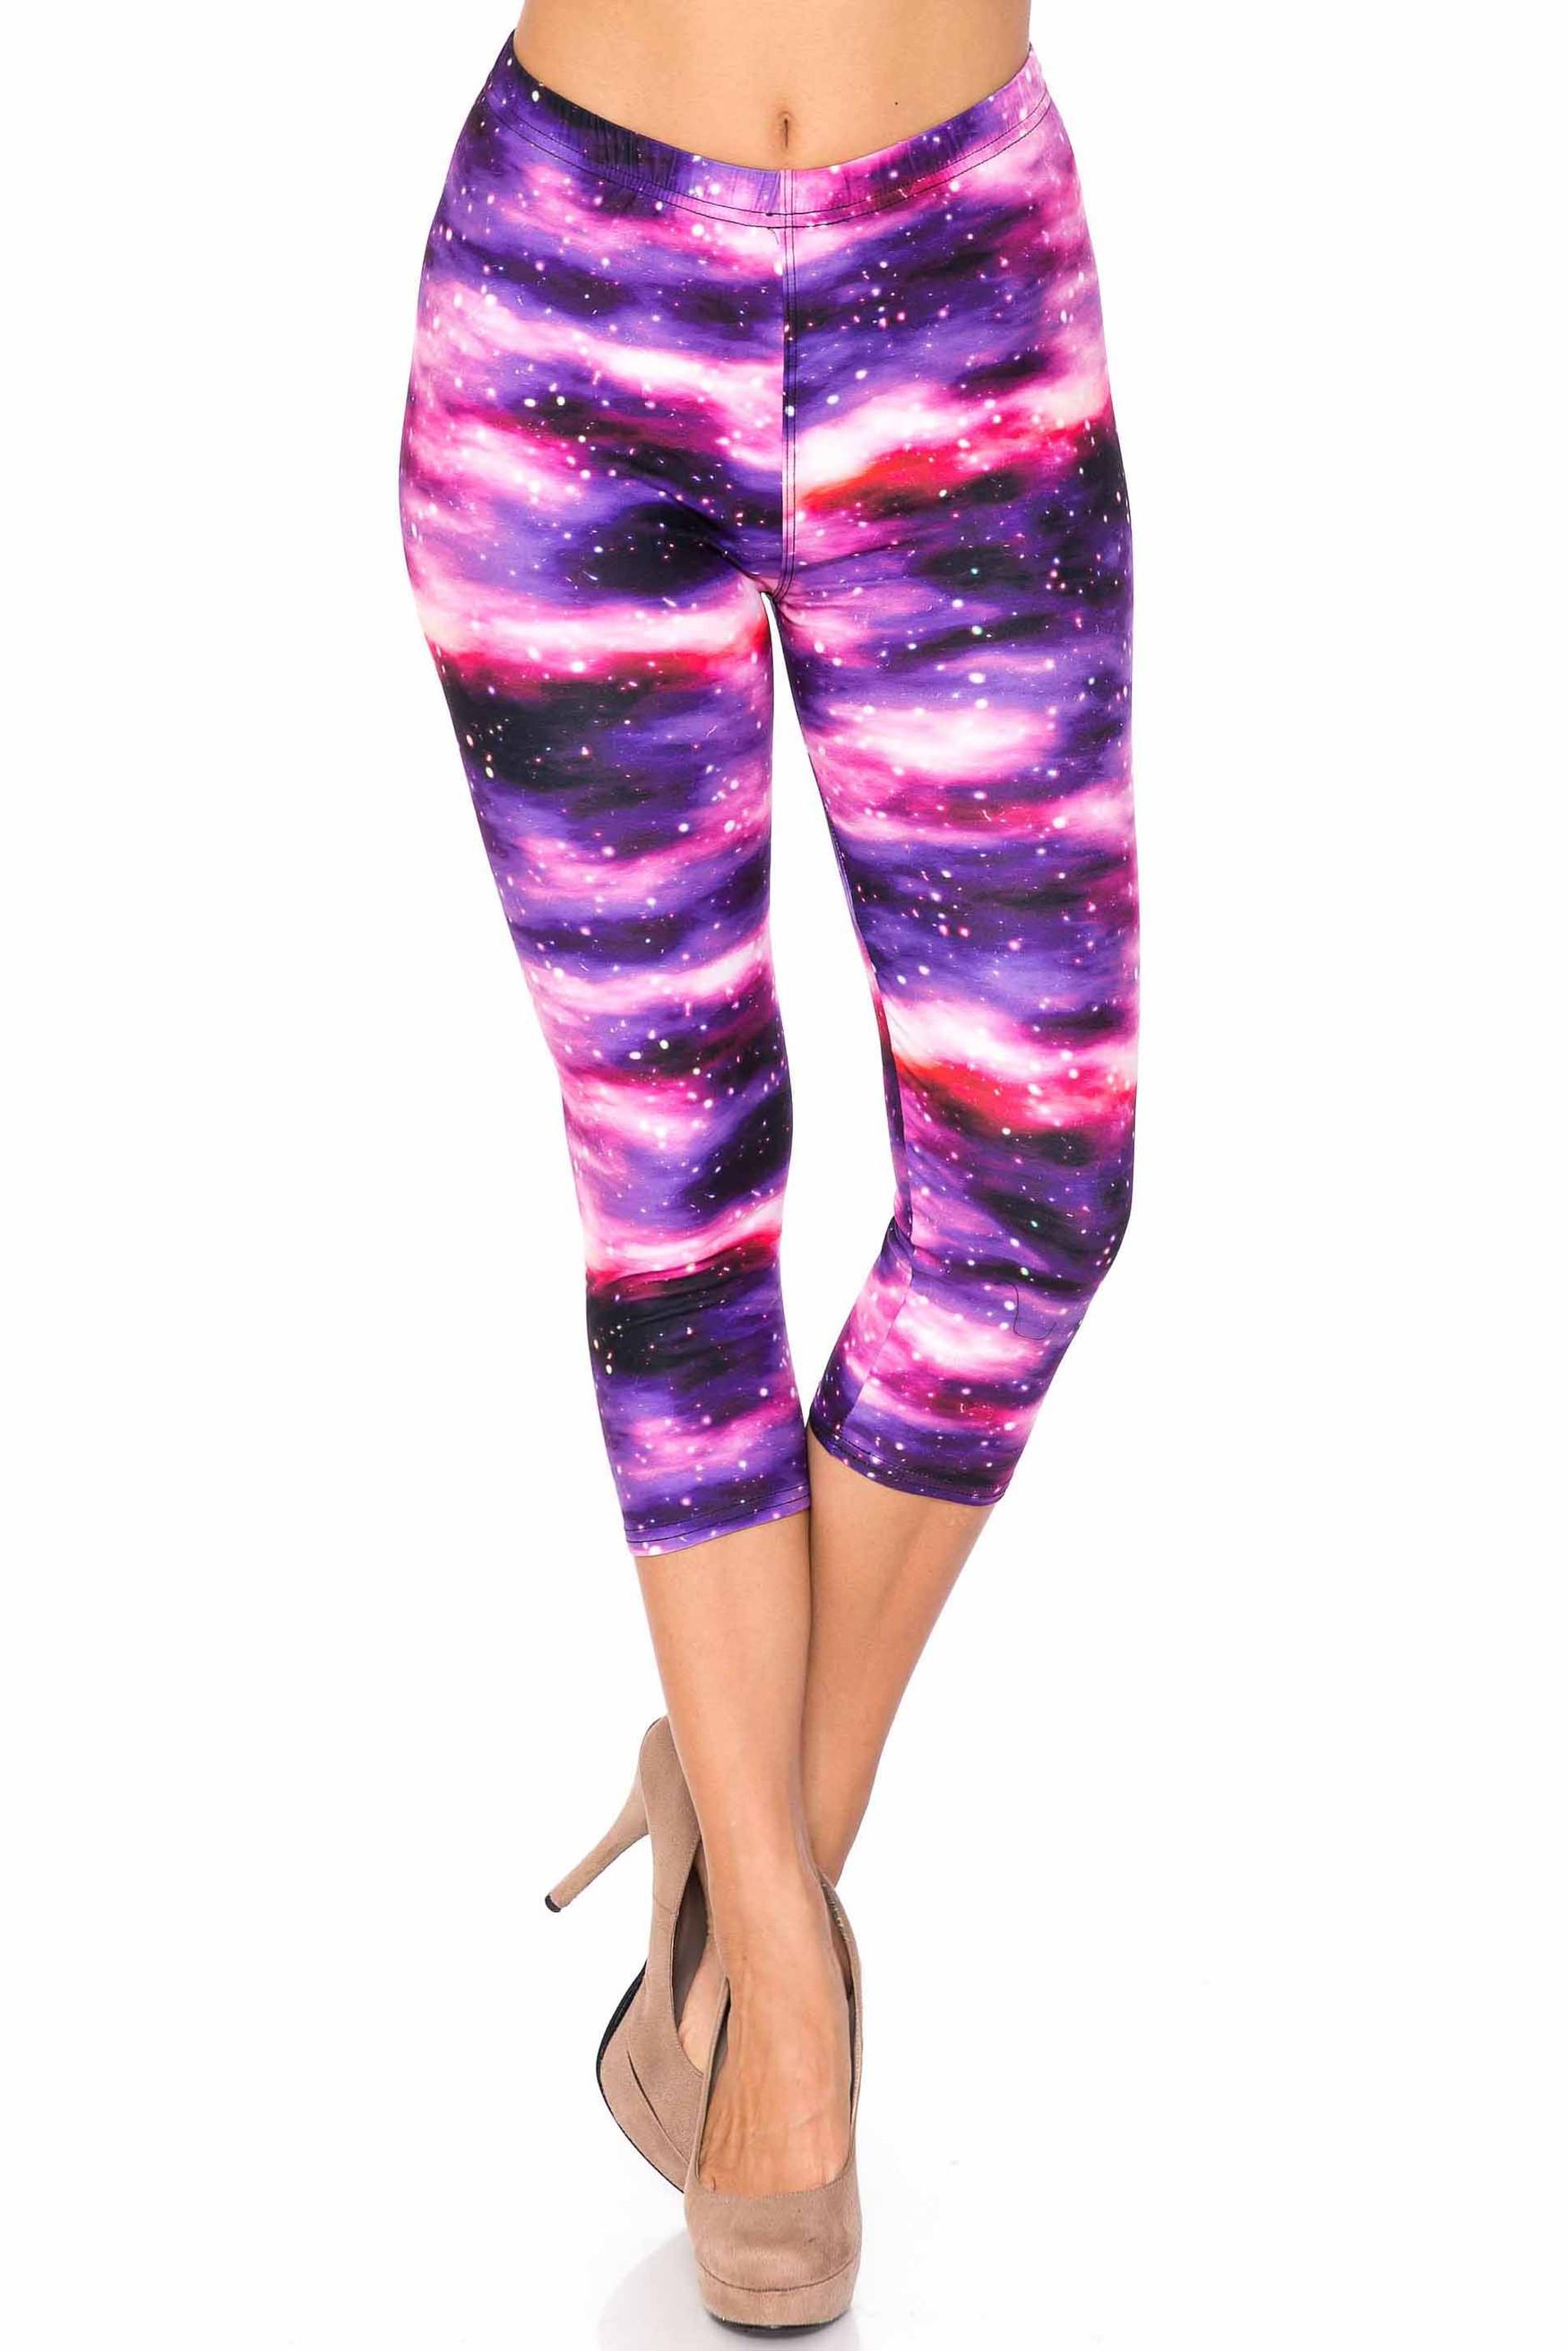 Creamy Soft Purple Mist Capris - USA Fashion™